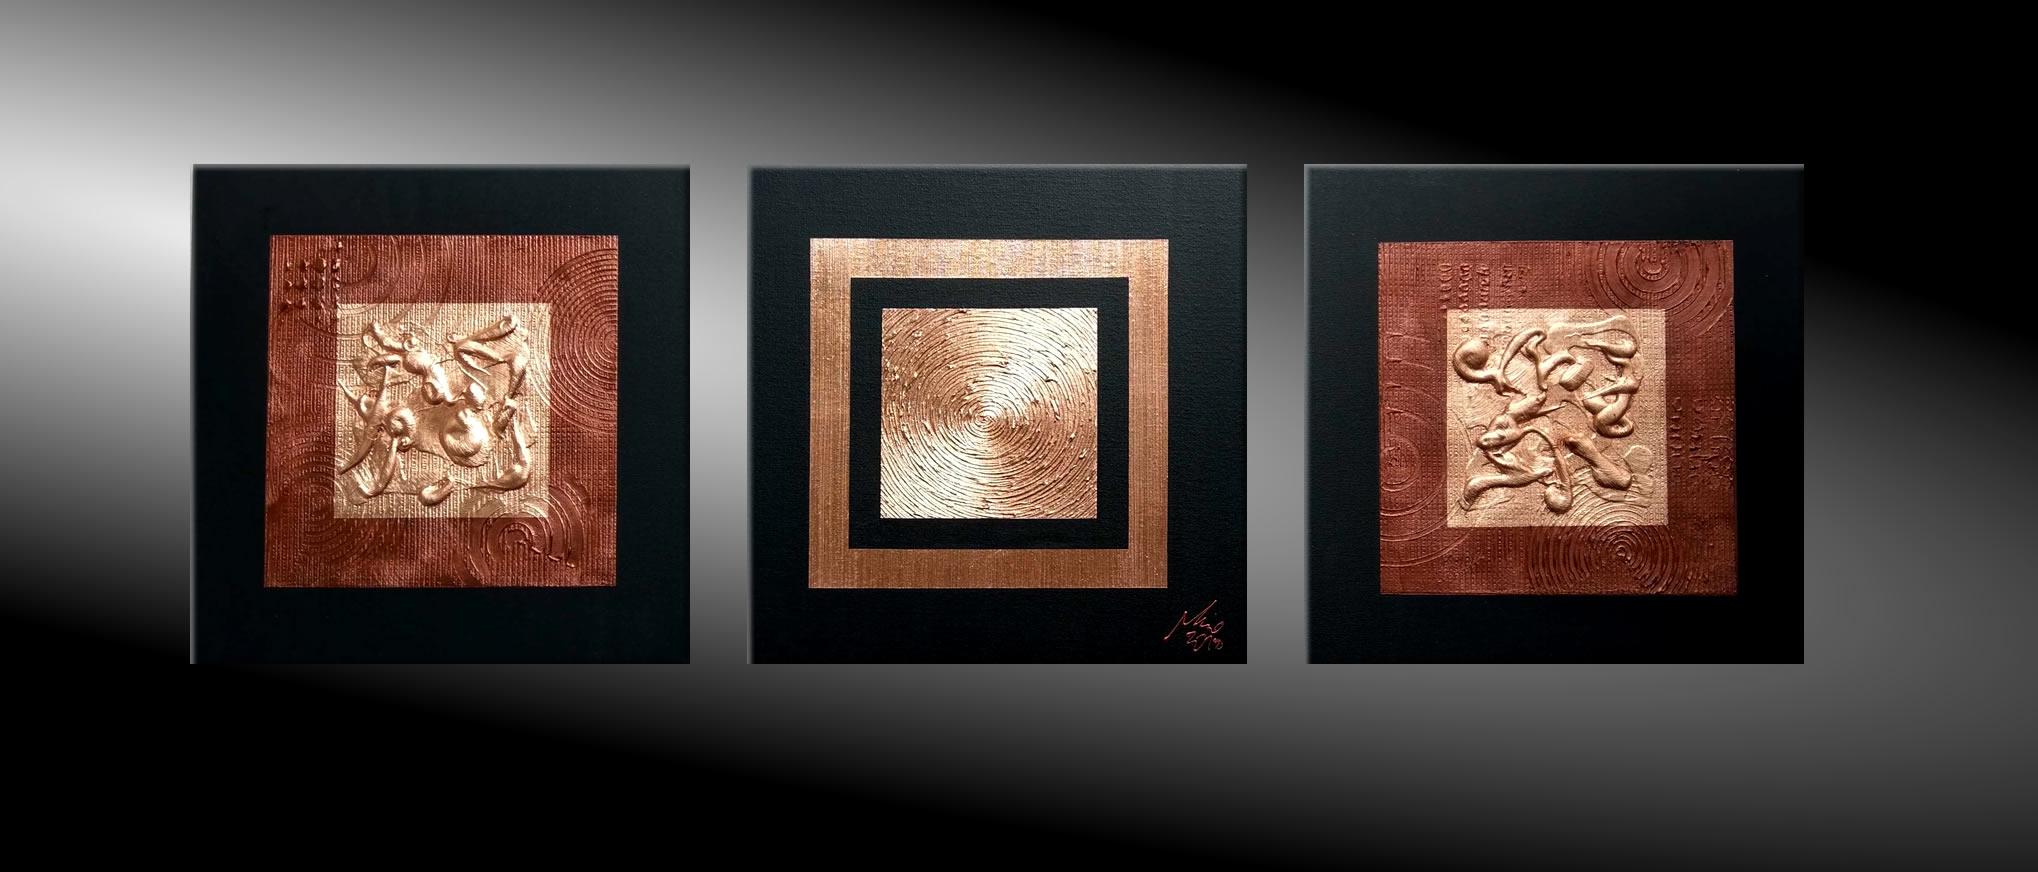 moderne malerei mico original kunst kaufen leinwand. Black Bedroom Furniture Sets. Home Design Ideas